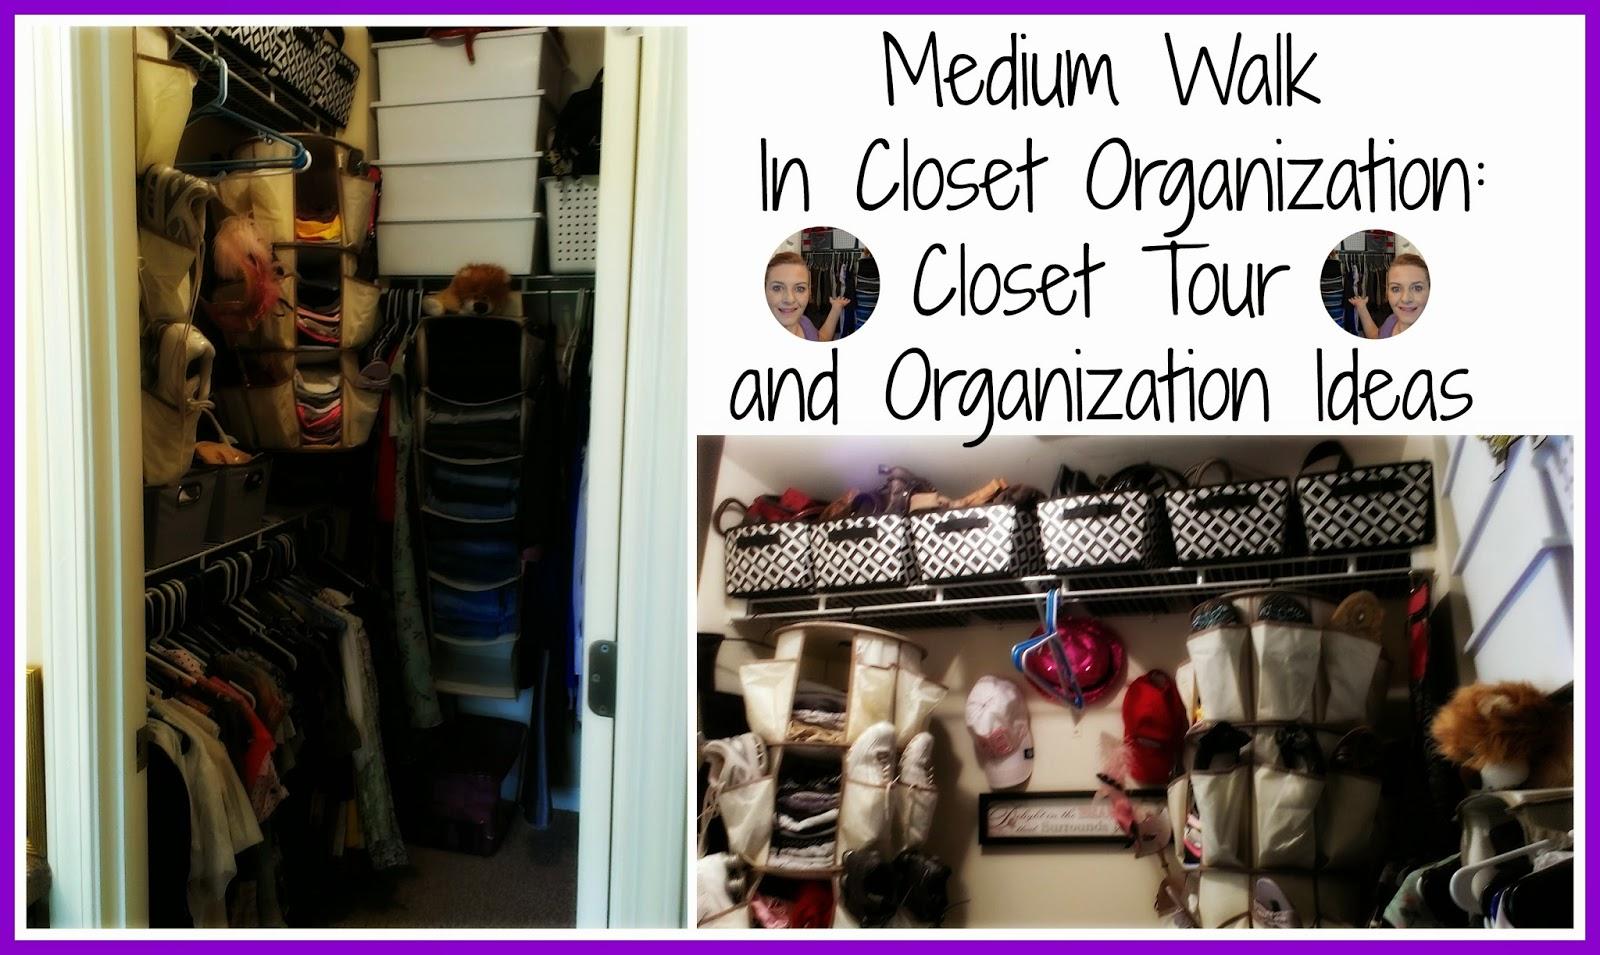 Medium Walk In Closet Organization: Closet Tour and Organization Ideas |  VIDEO |